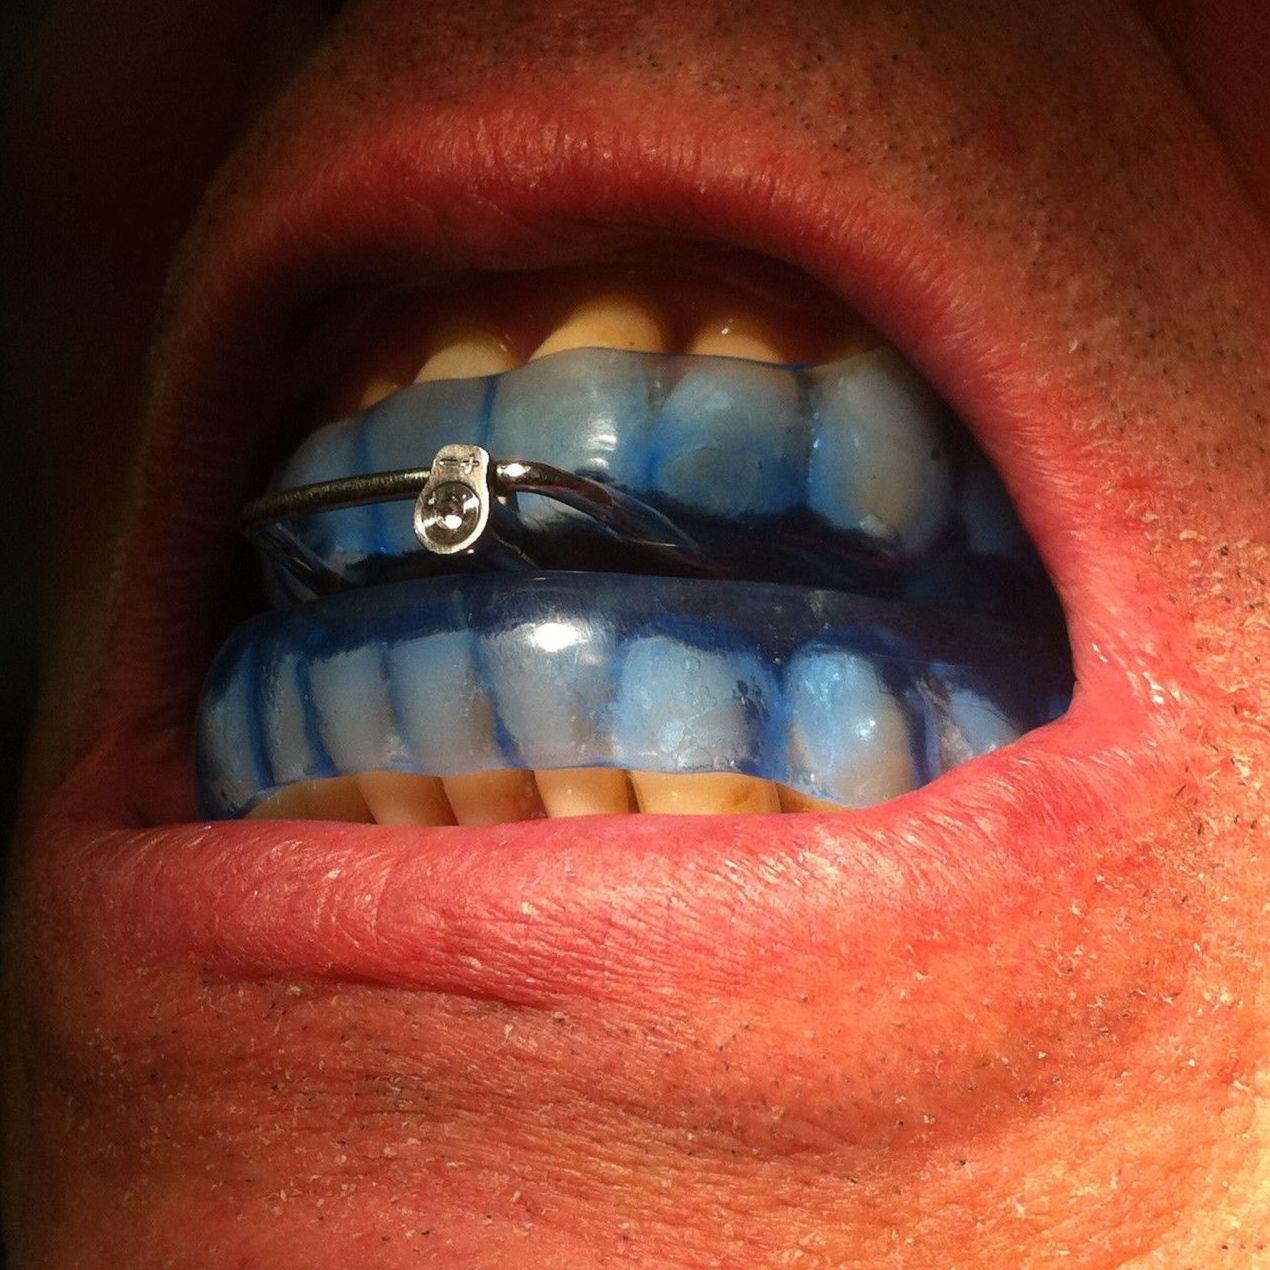 foto dam,dispositivo de avance mandibular,D.A.M,apnea del sueño,antirronquidos,